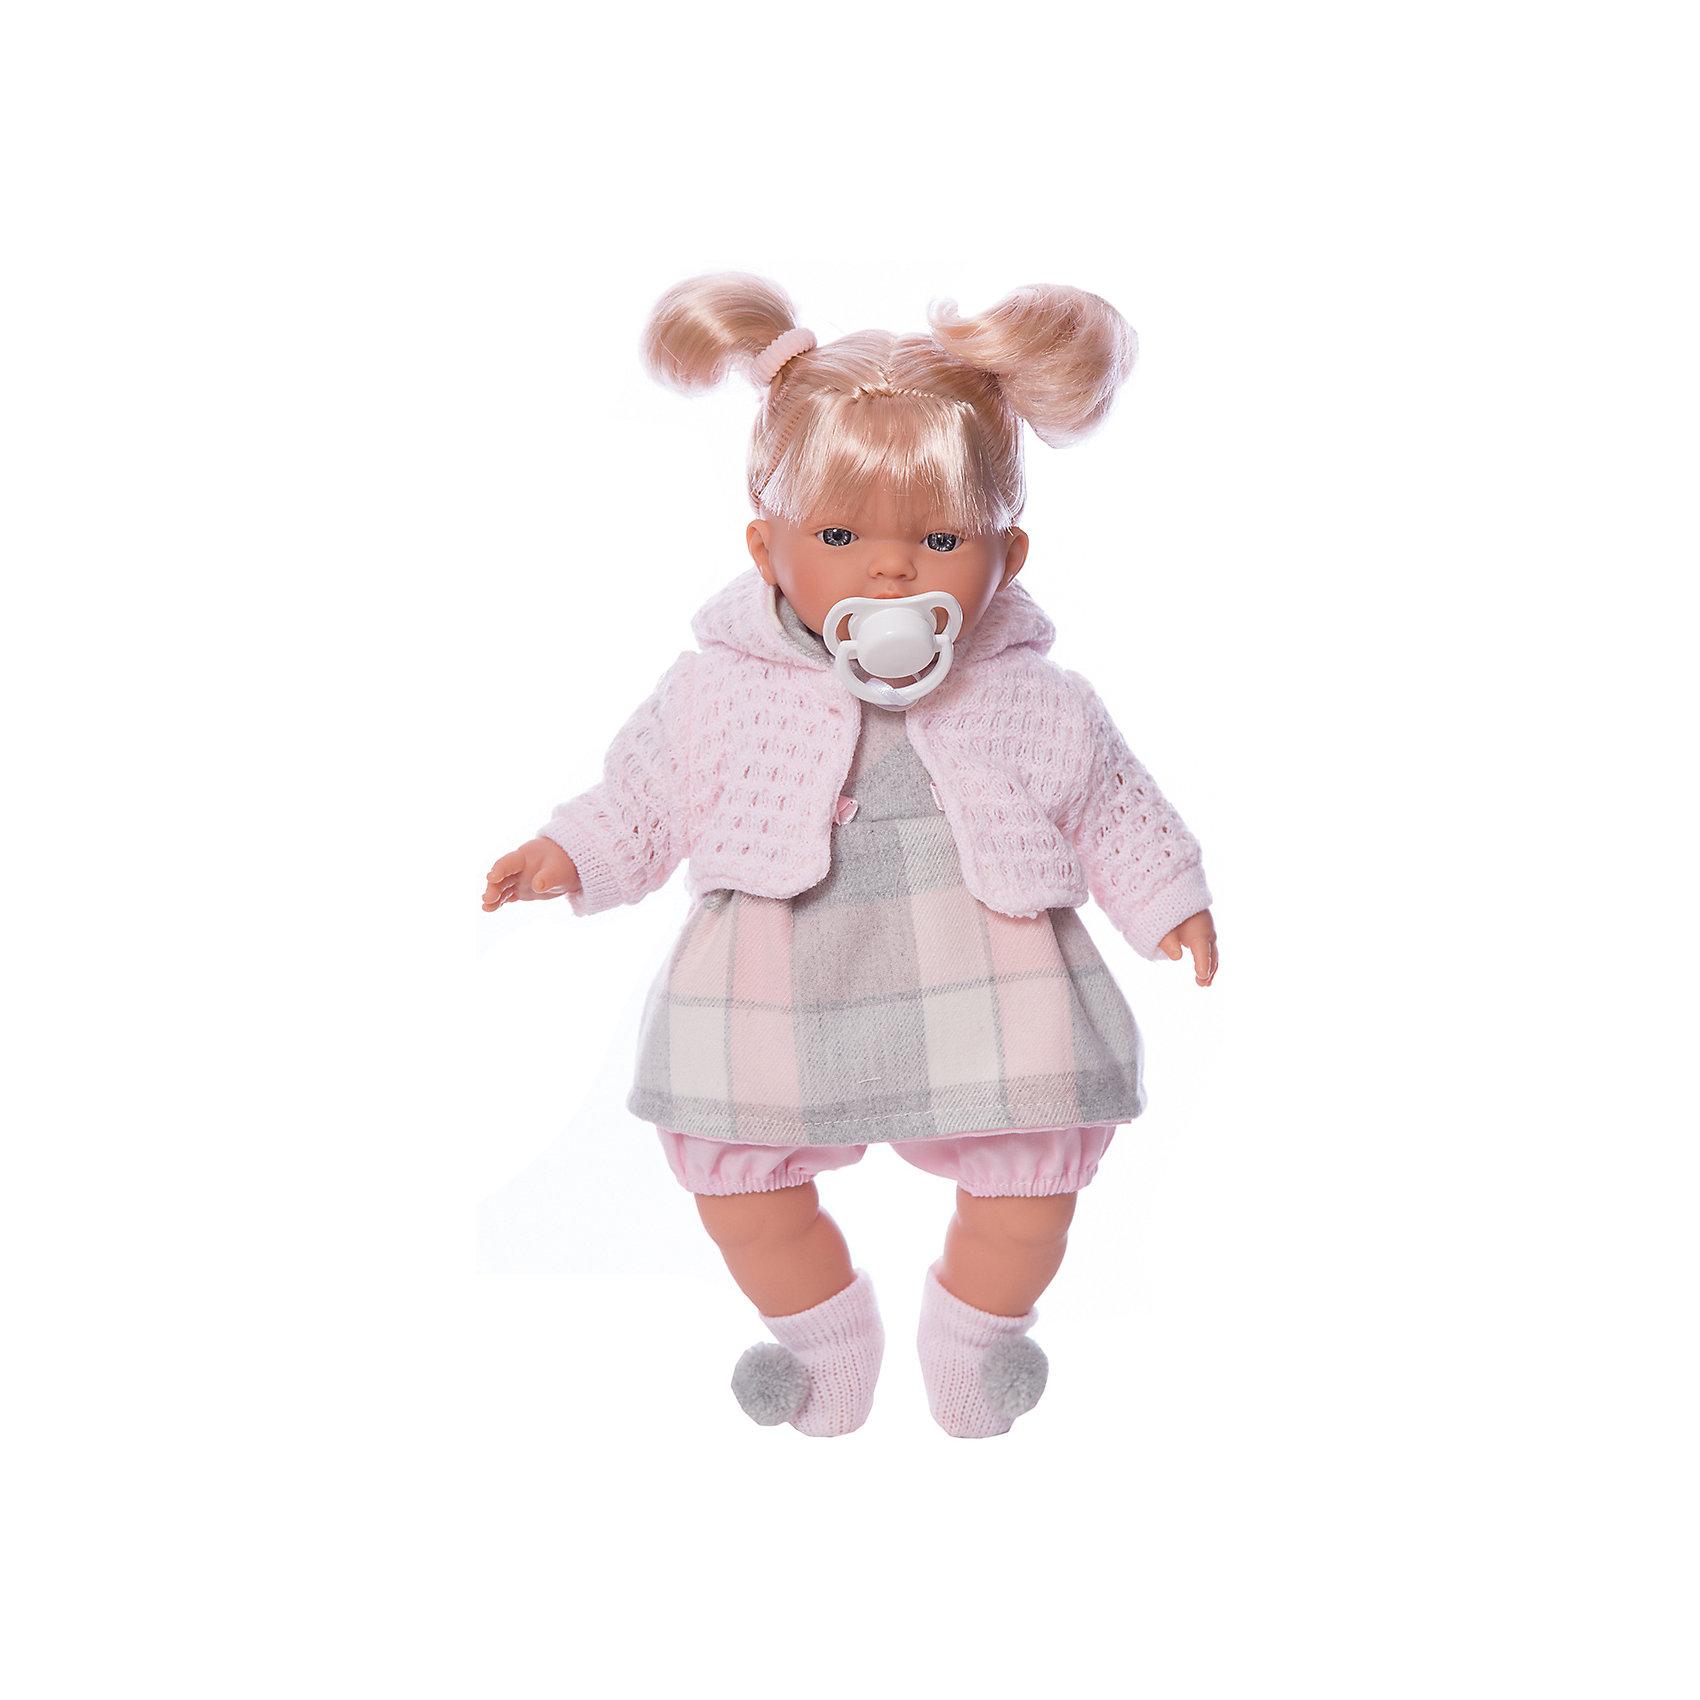 Llorens Кукла Аитана, 33 см, Llorens куклы и одежда для кукол llorens кукла изабела 33 см со звуком